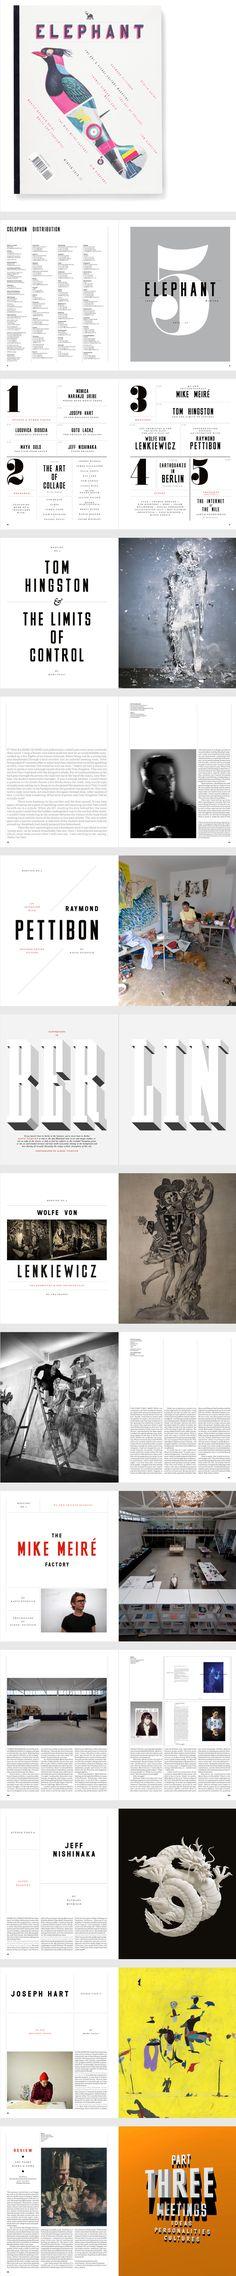 Elephant Magazine, Issue 5 by Matt Willey editorial design